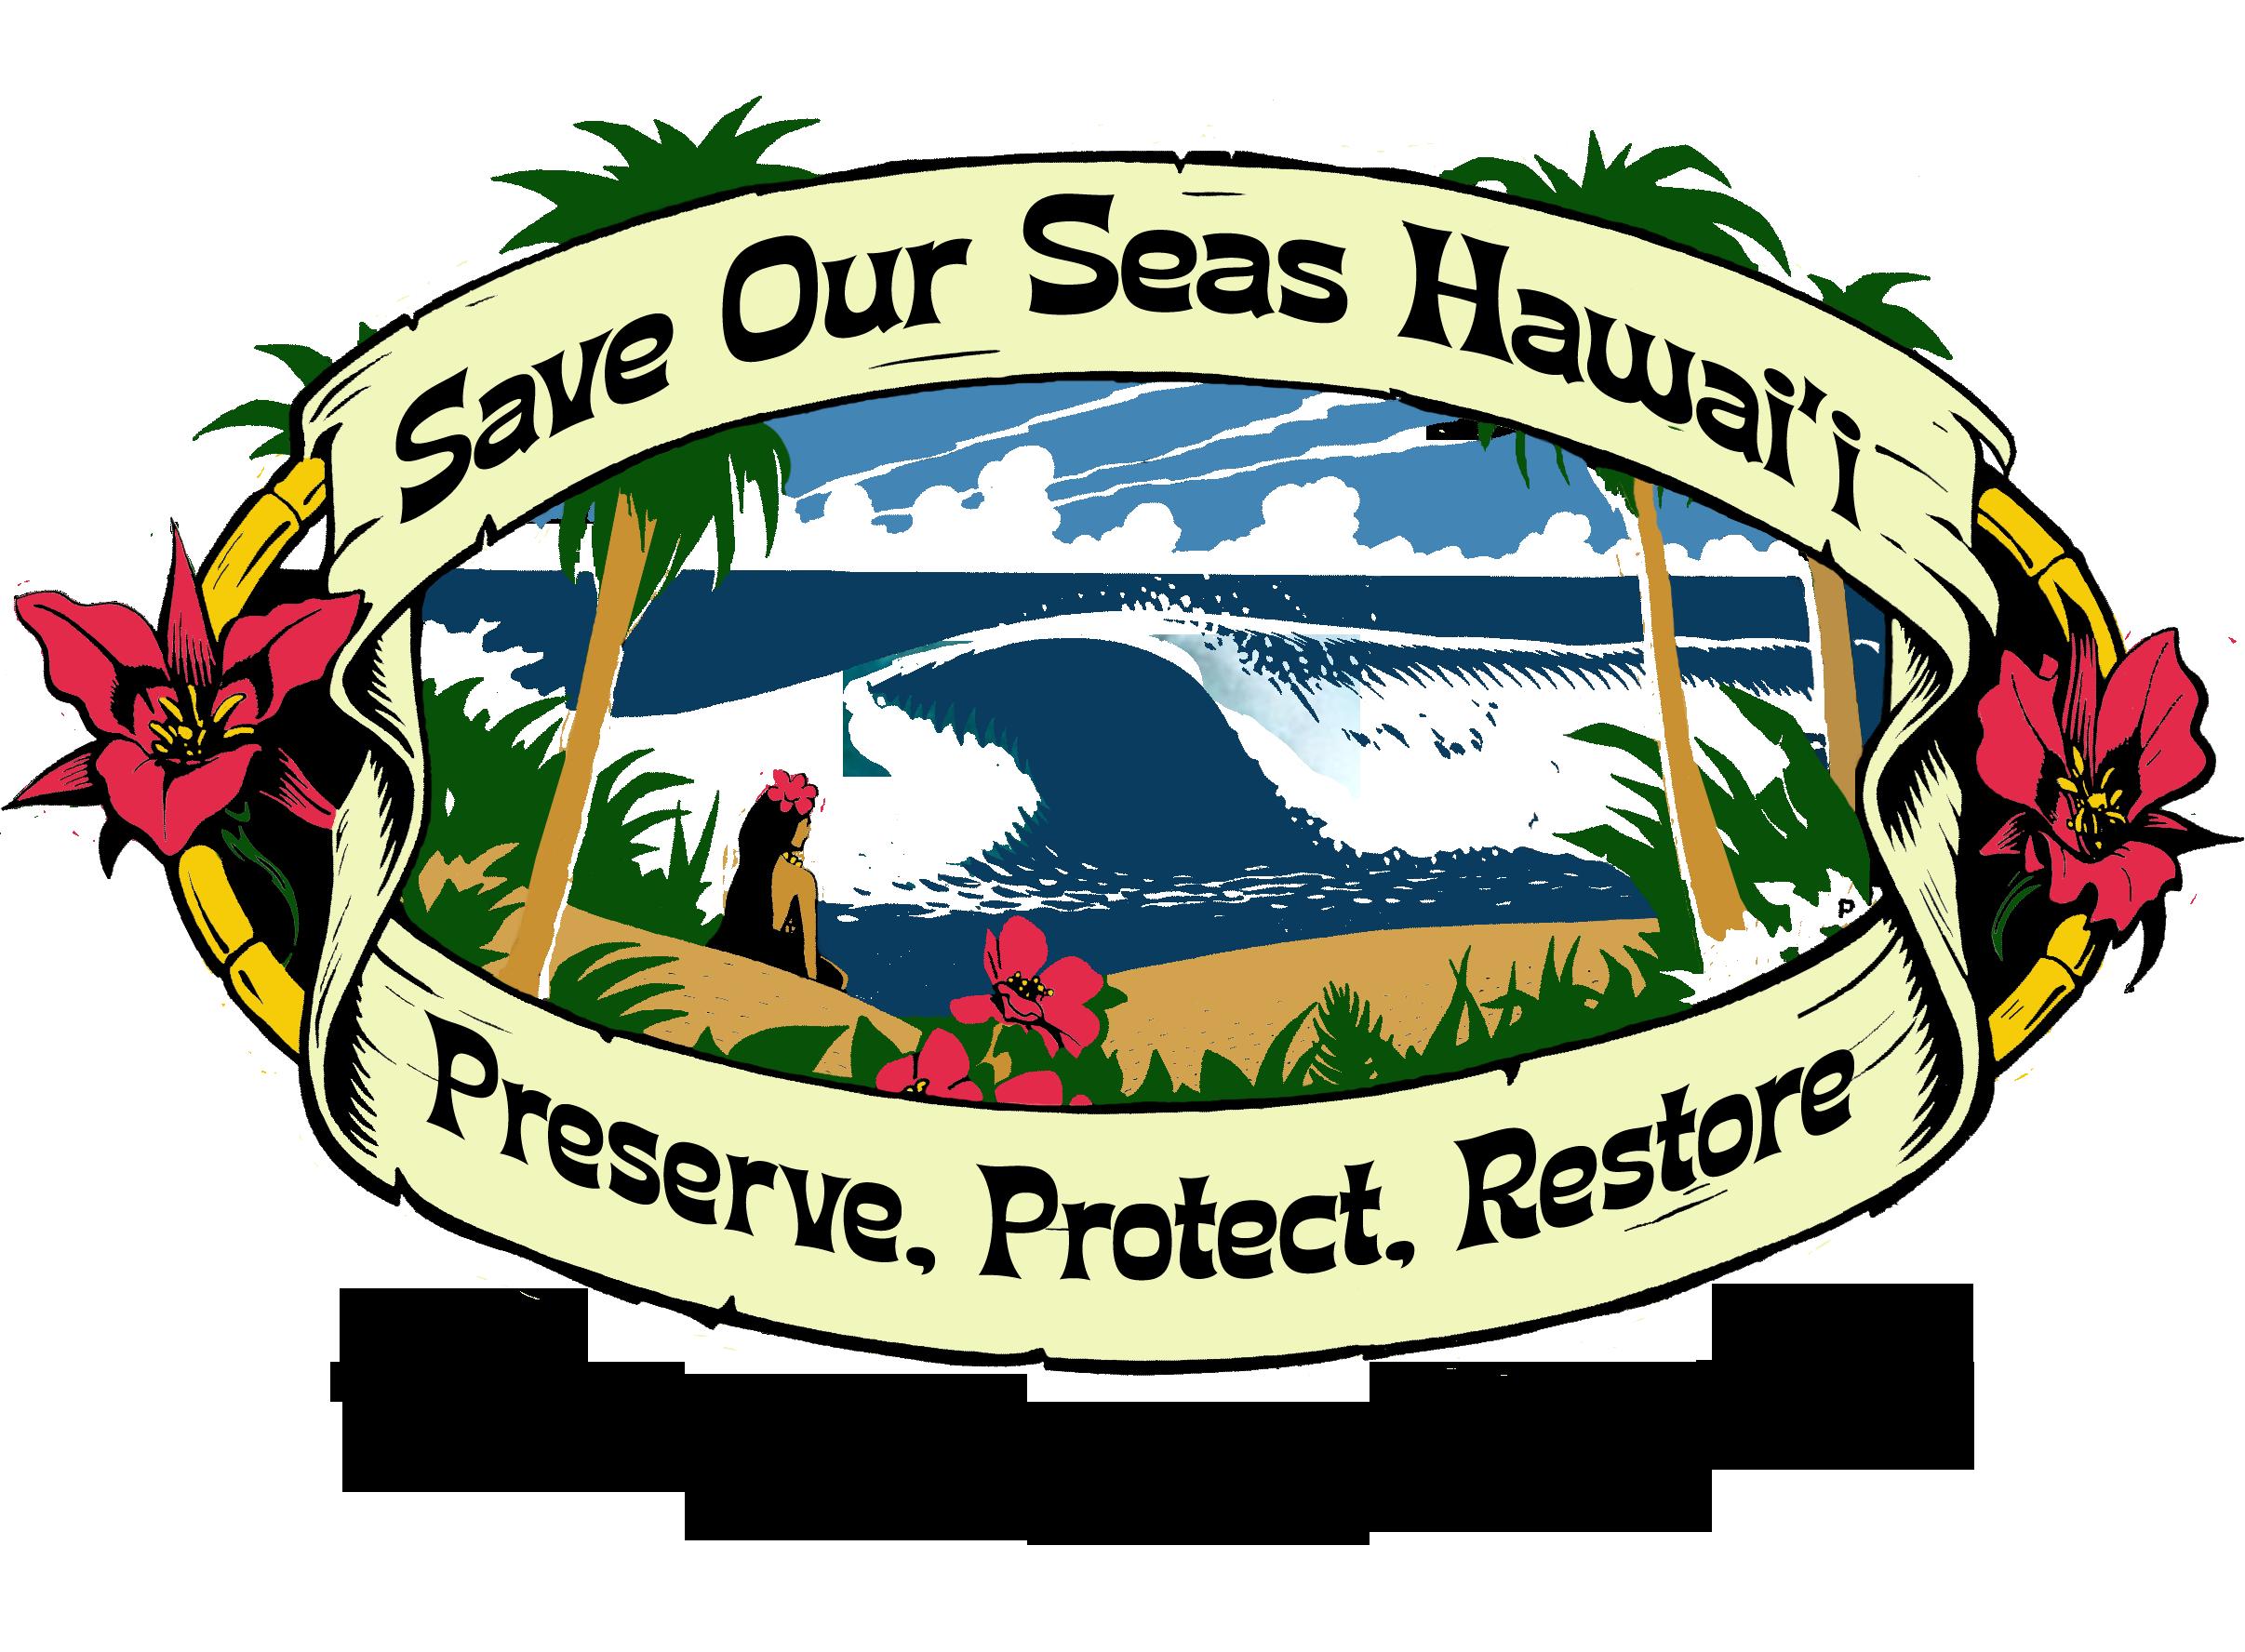 Garbage clipart drawing ocean. Save our seas hawaii